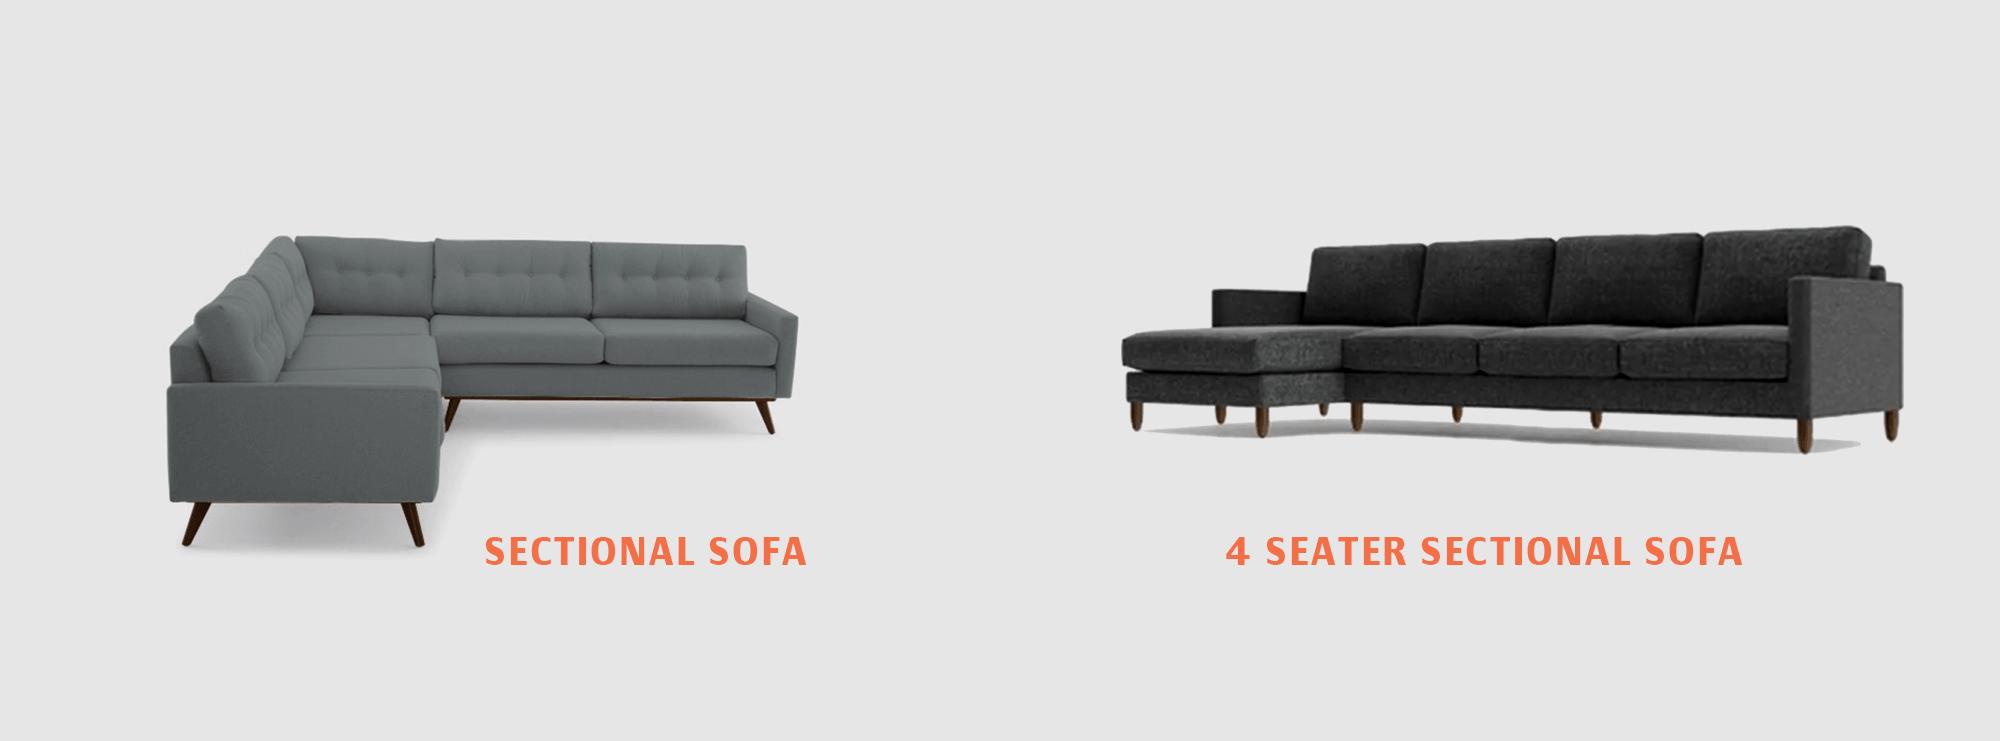 sectional-sofa chennai